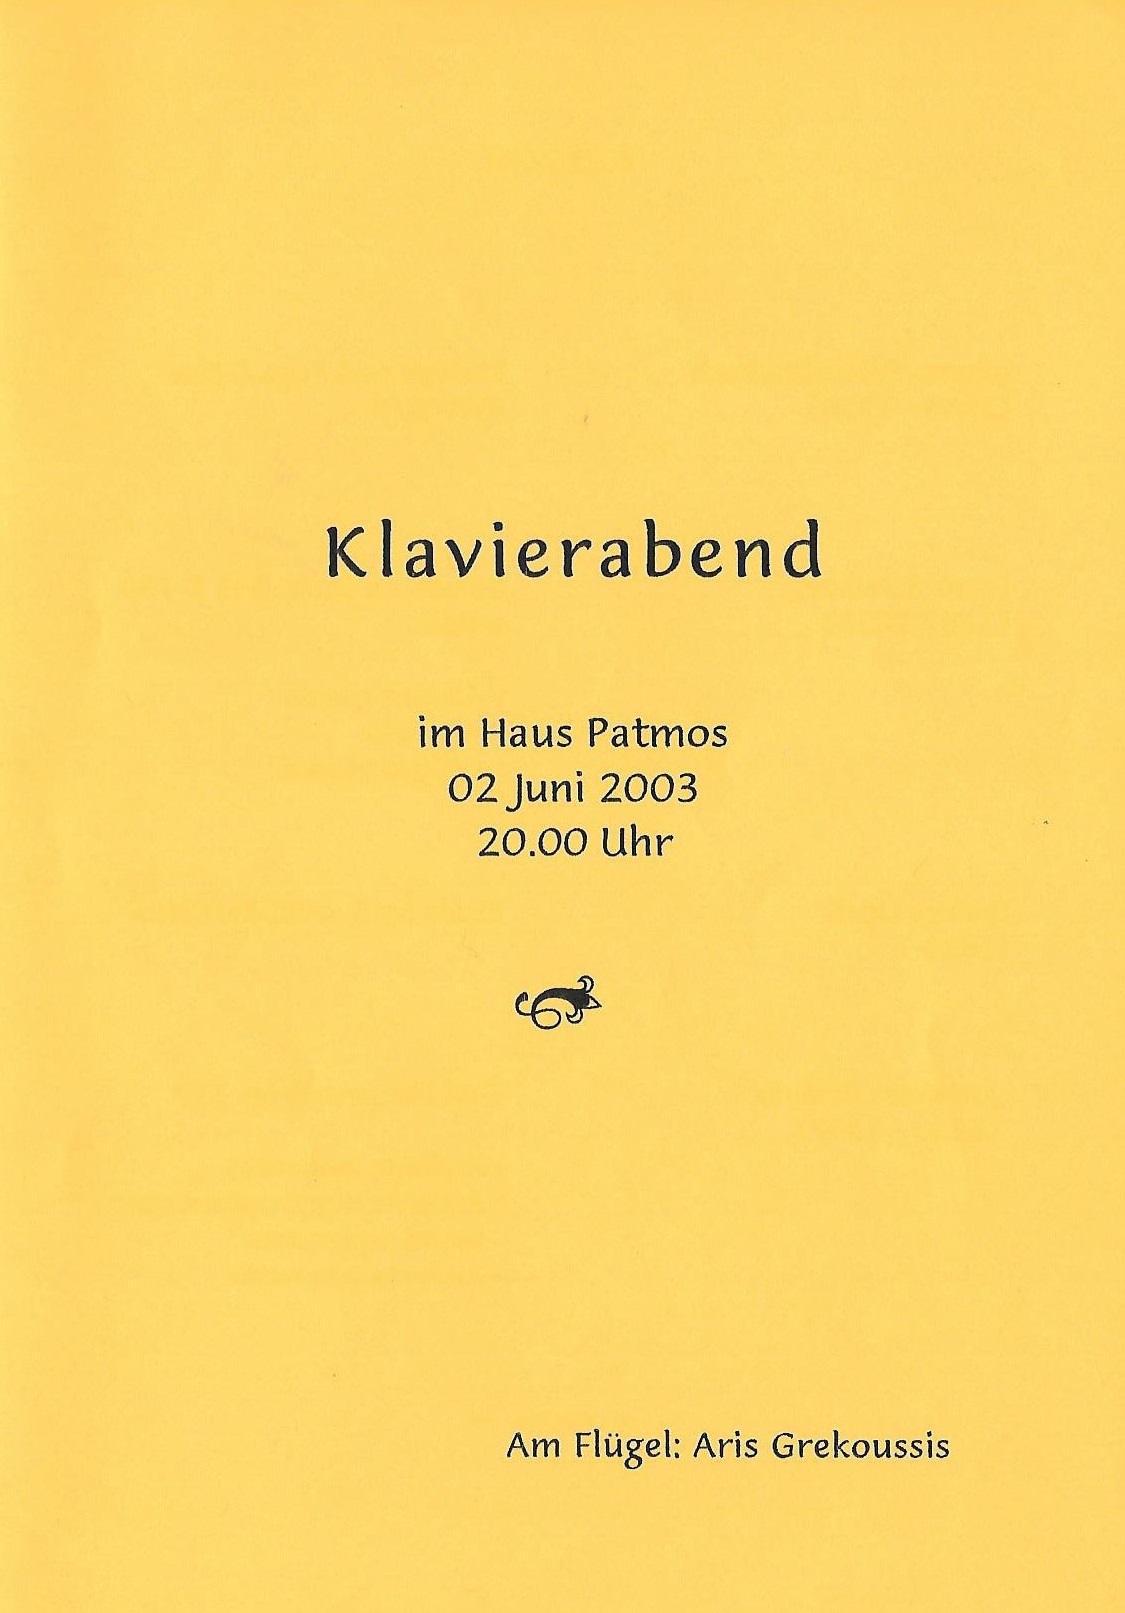 2003-06-03α